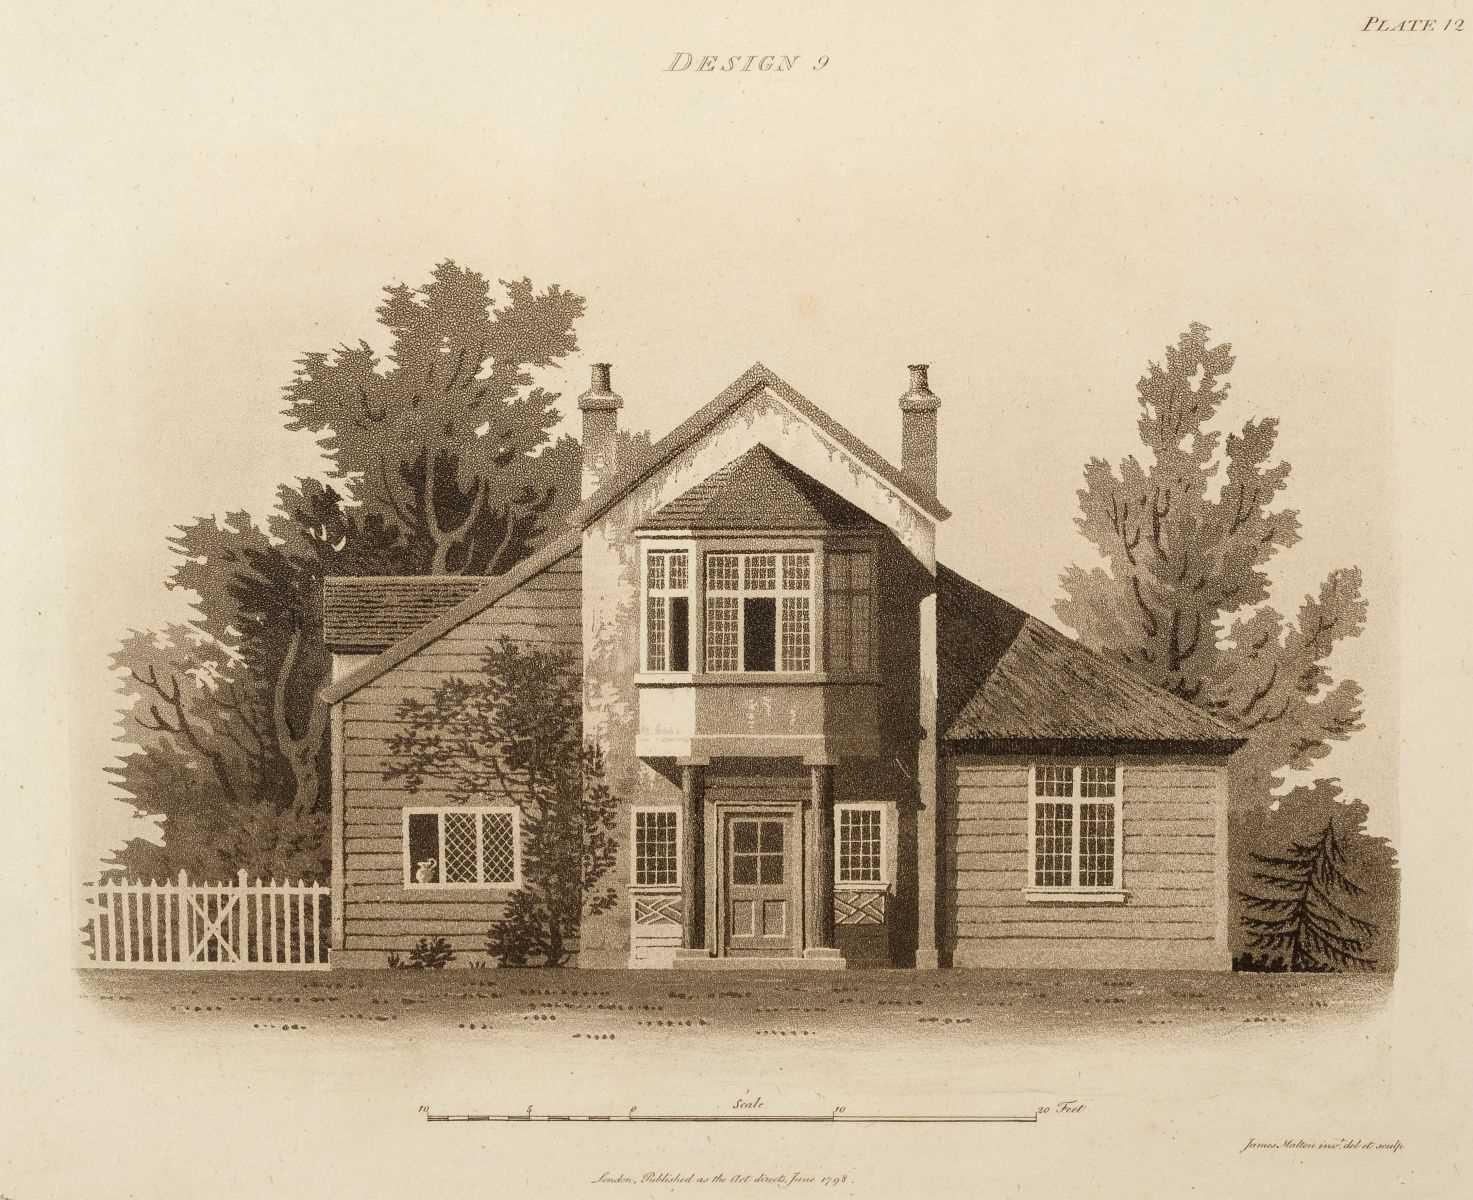 Lot 334 - Malton (James). An Essay on British Cottage Architecture, 1804